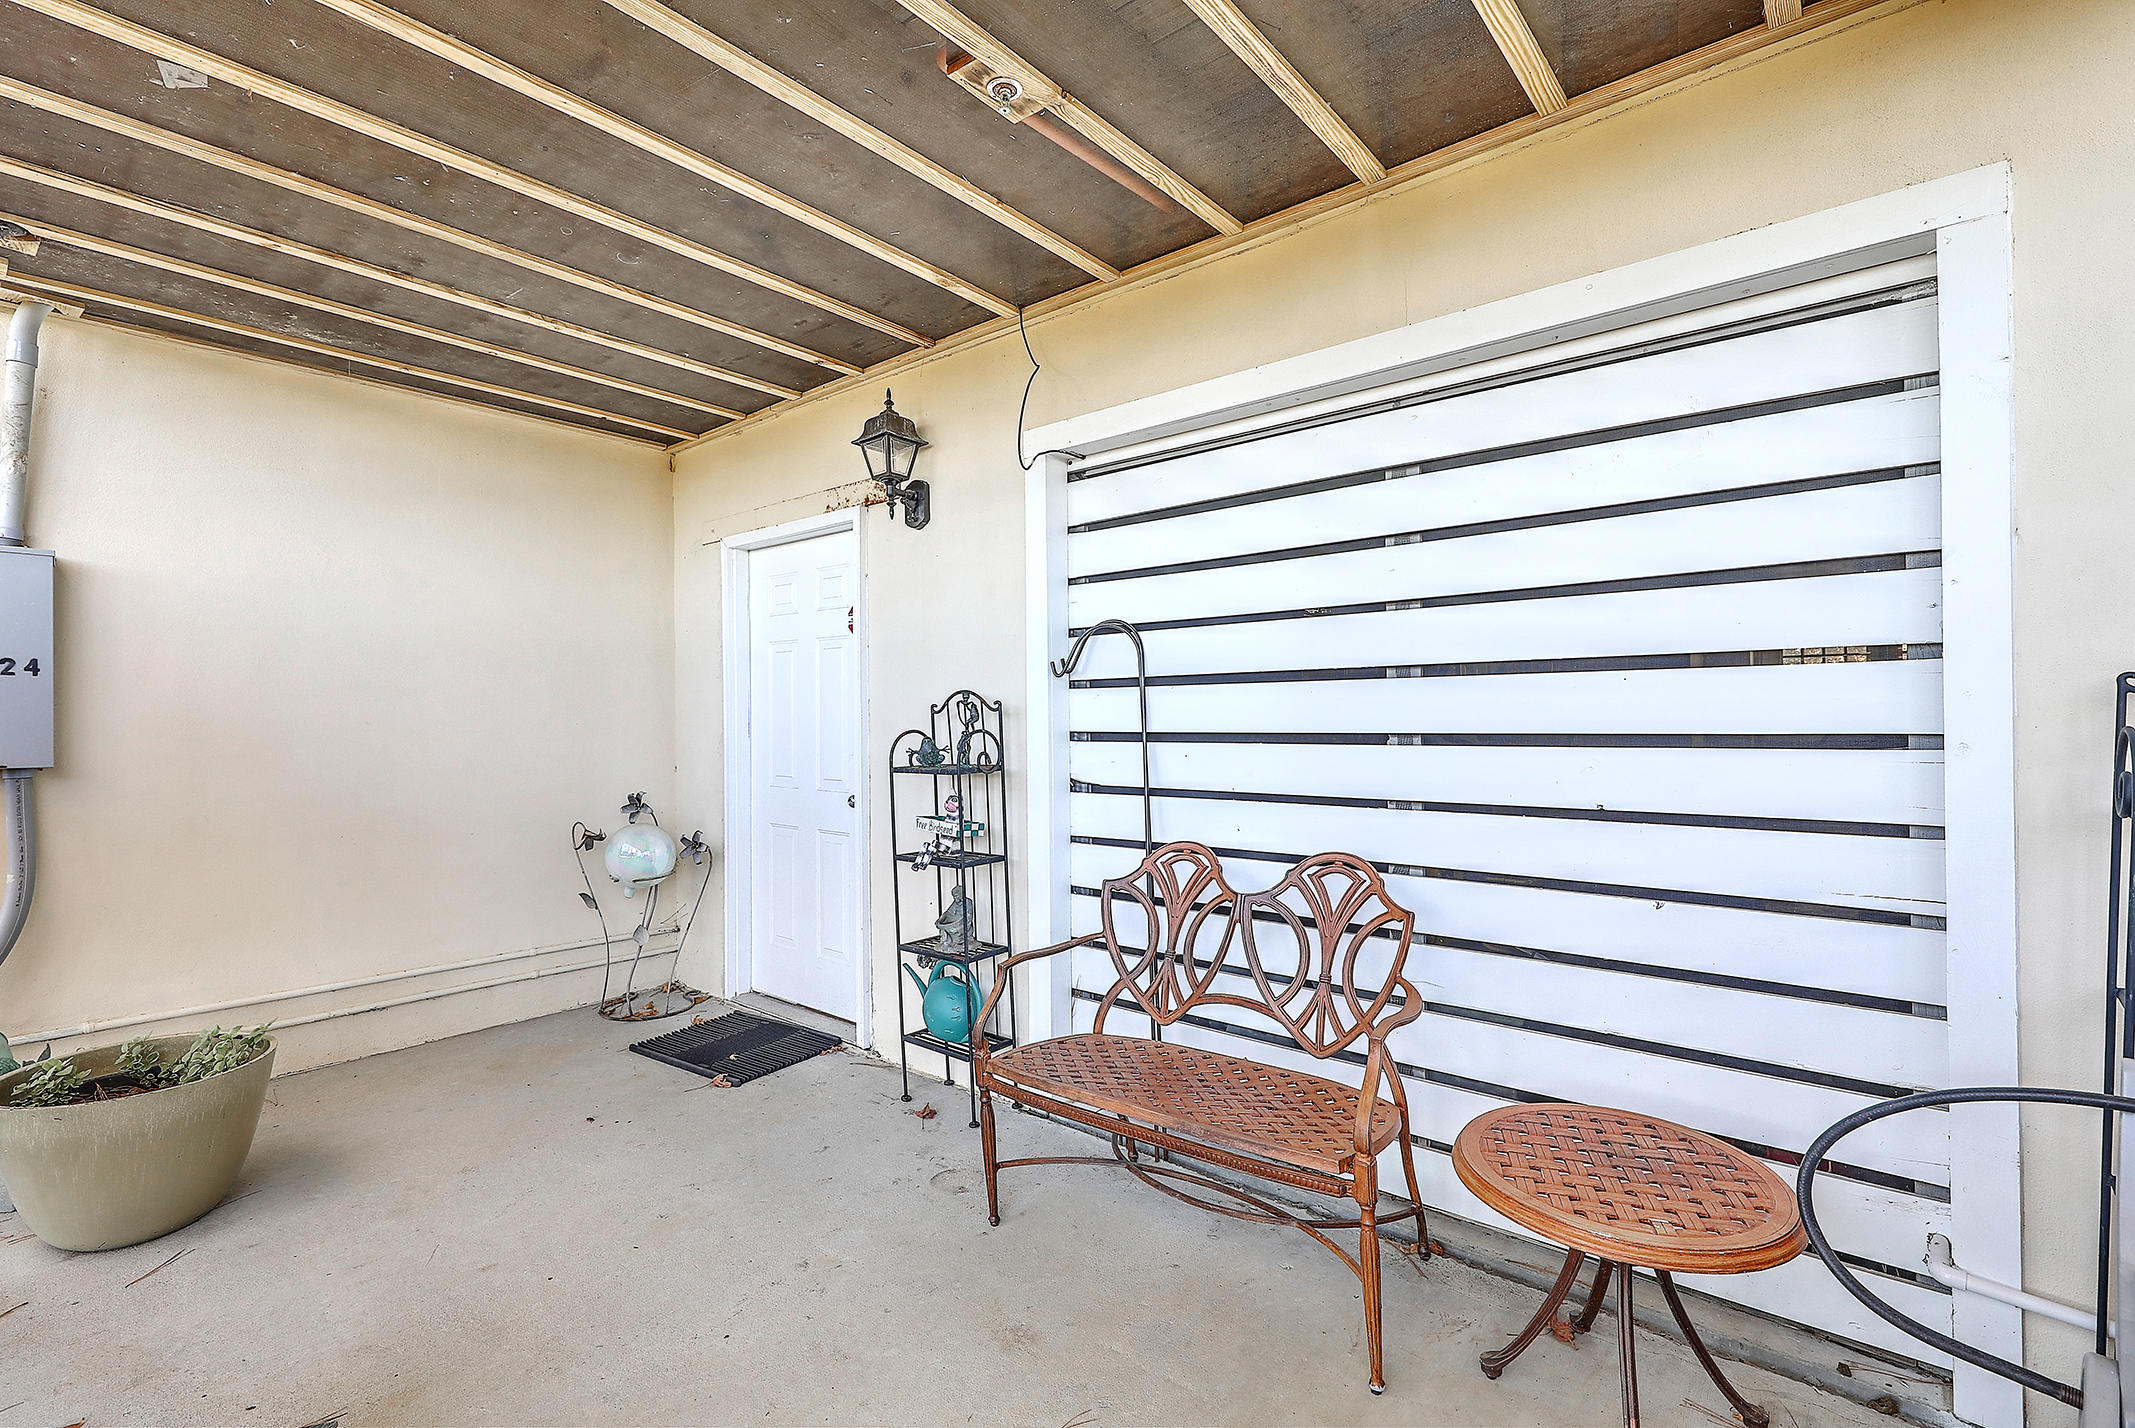 Etiwan Pointe Homes For Sale - 124 Winding Creek, Mount Pleasant, SC - 4